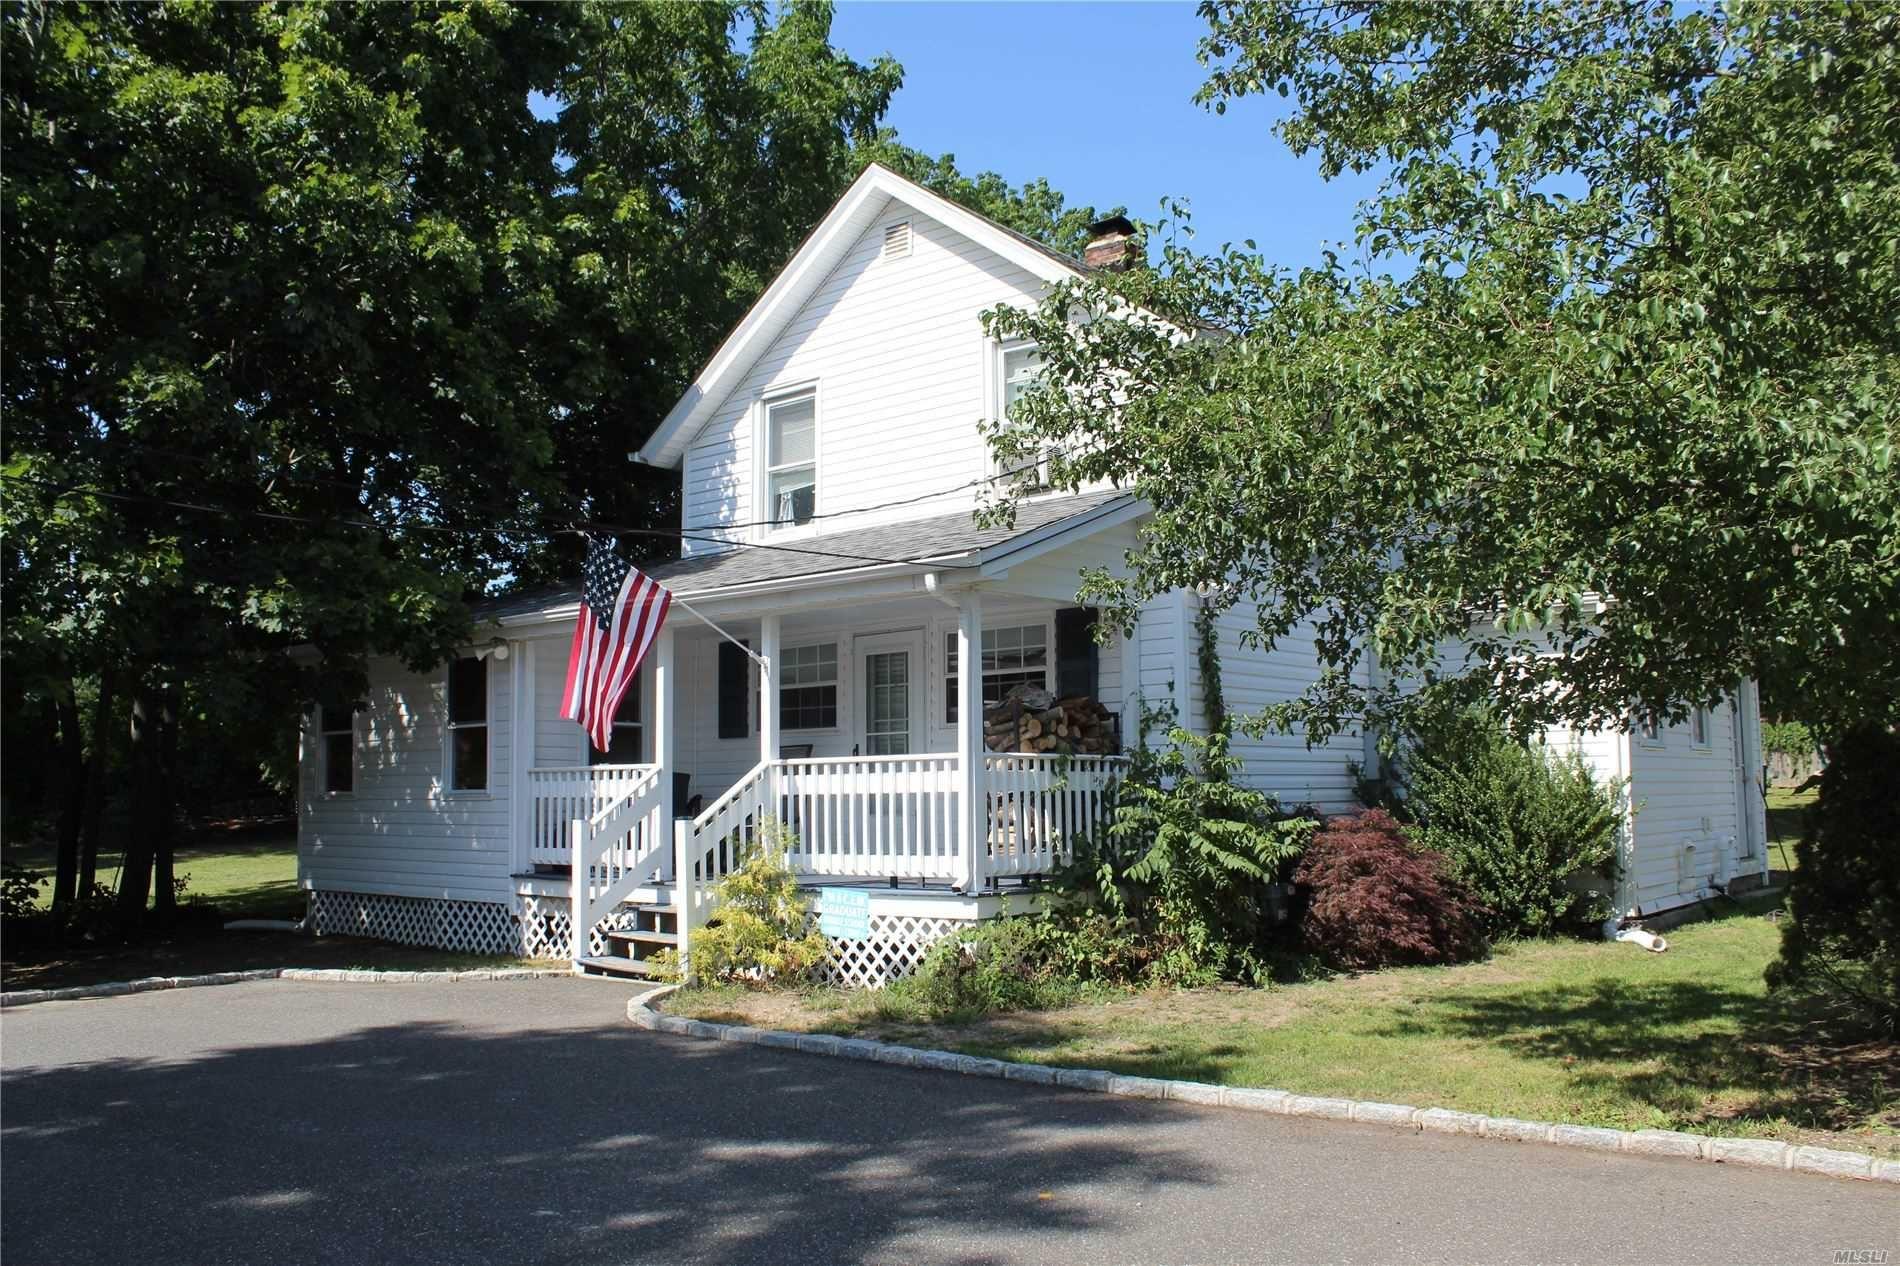 39 Yaphank Middle Island Rd, Middle Island, NY 11953 - MLS#: 3234821